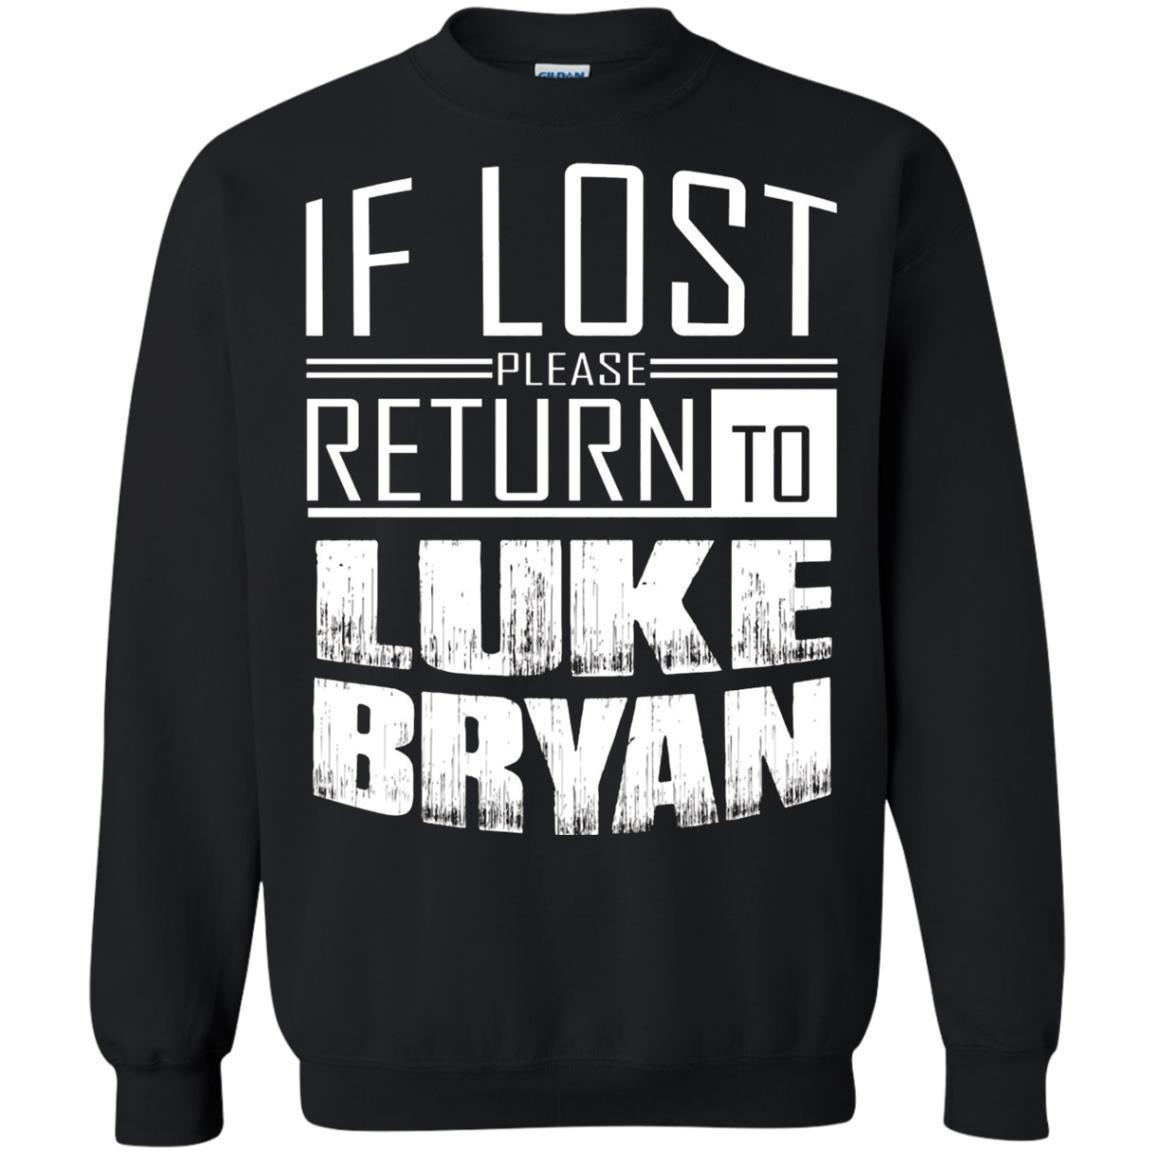 if lost please return to luke name bryan – Crewneck Pullover Sweatshirt